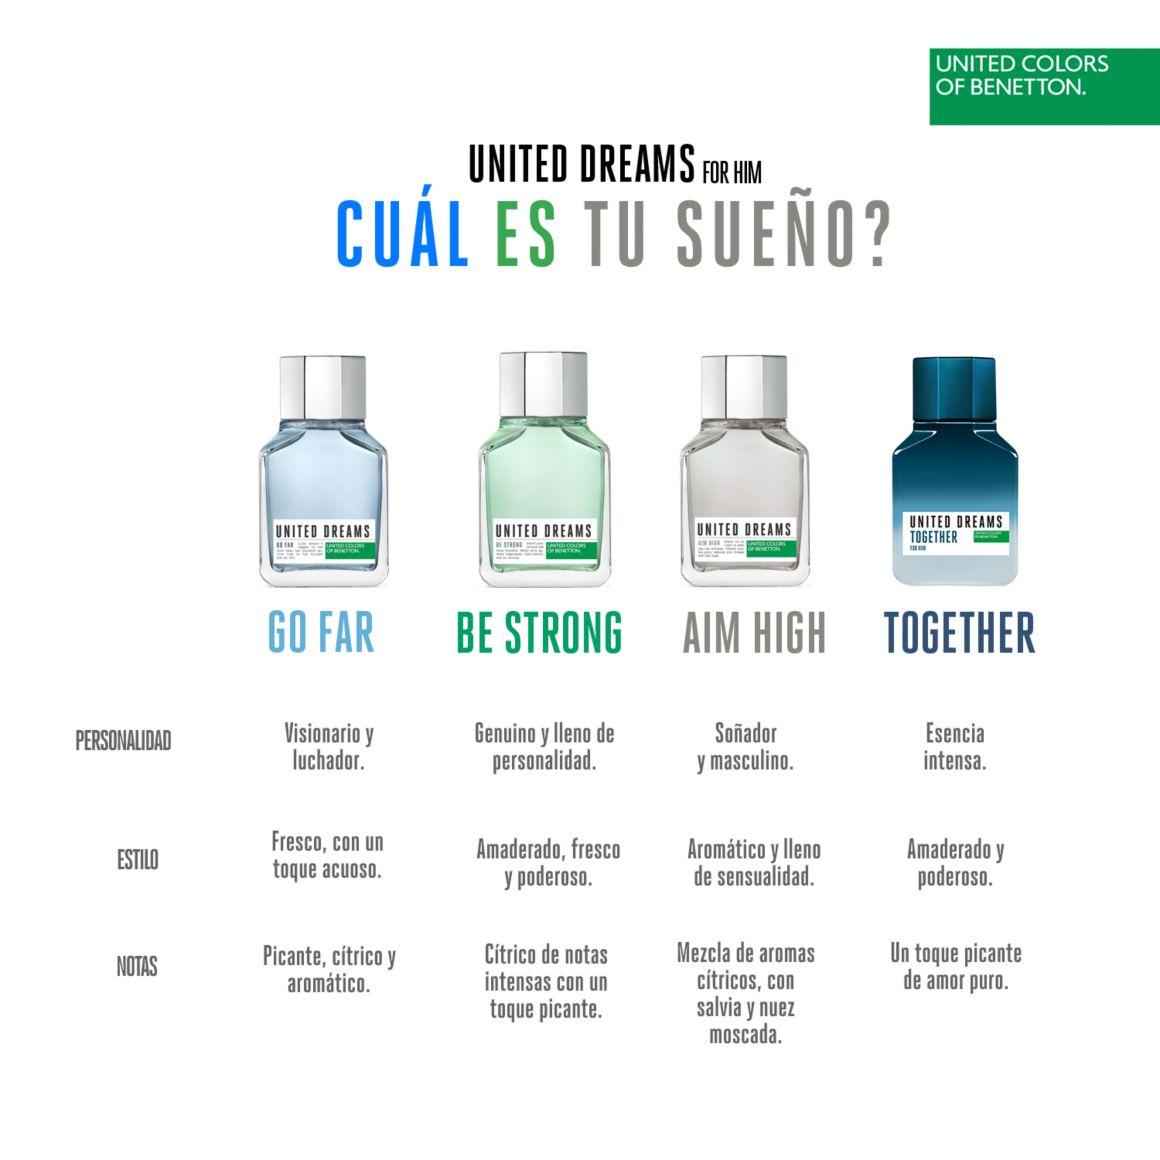 United Colors of Benetton, Benetton, United Dreams,Aim High, hombre, colonia, perfume